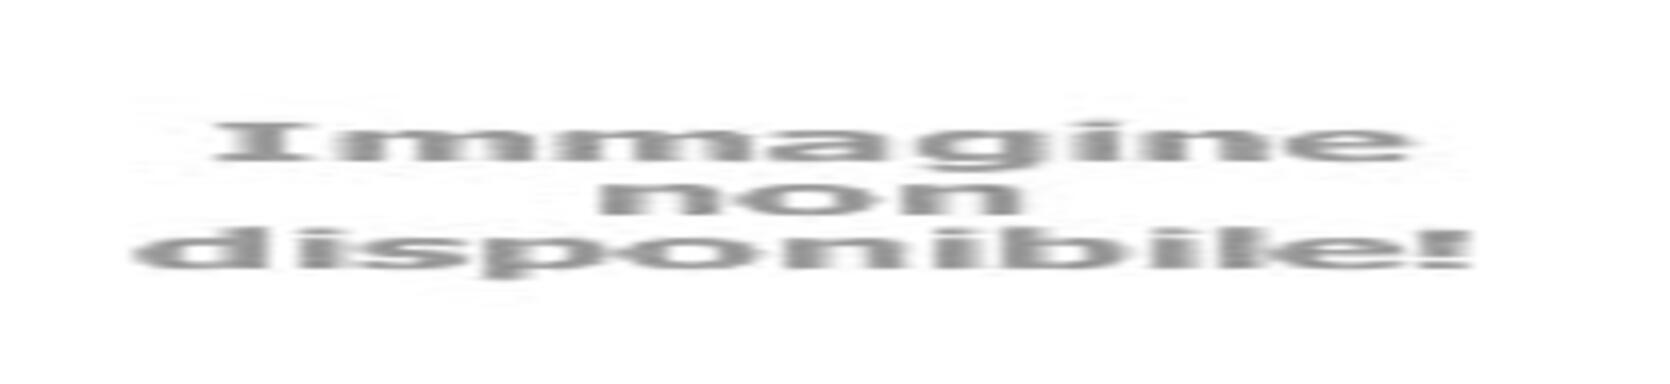 basketriminicrabs it 2-2755-settore-giovanile-u14-elite-renzo-galli 005